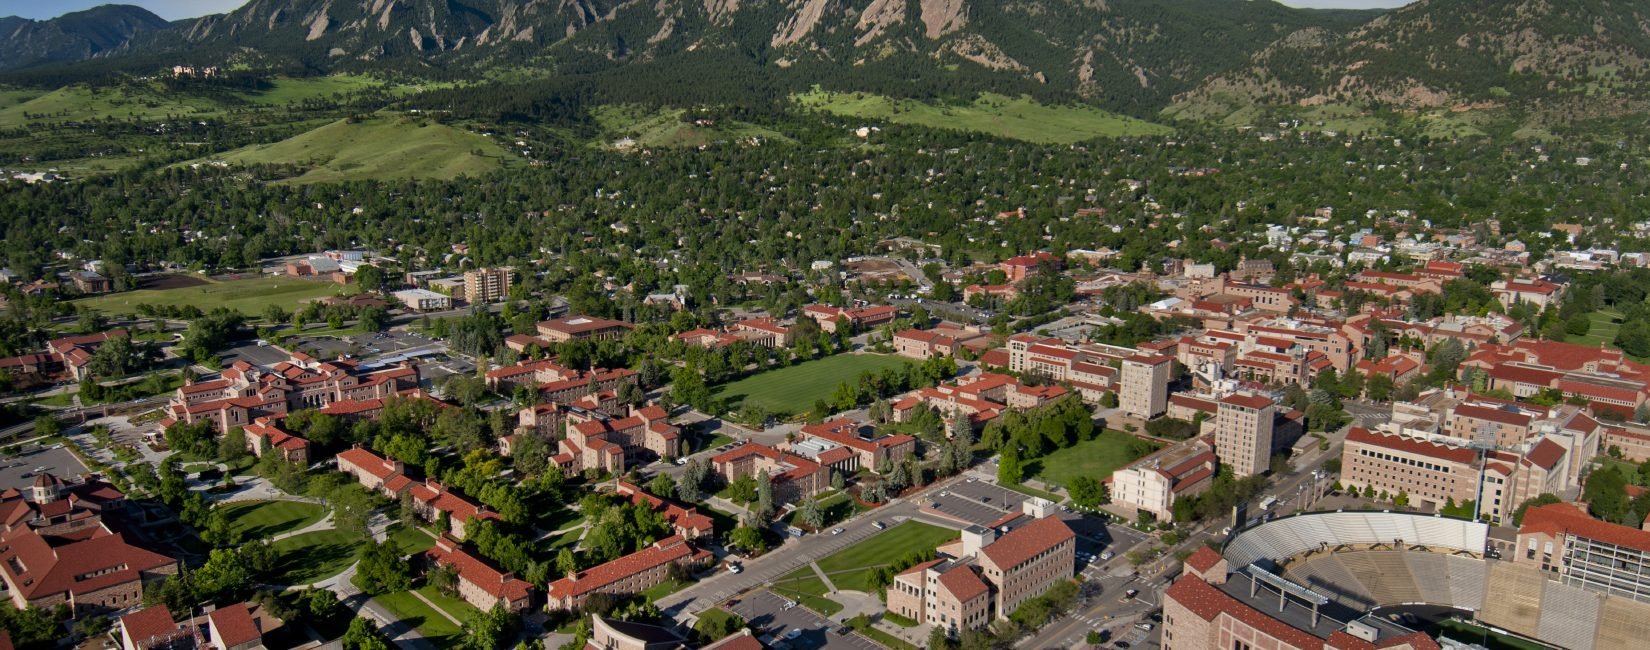 Aerial photo of the University of Colorado Boulder campus. (Photo by Glenn Asakawa/University of Colorado)